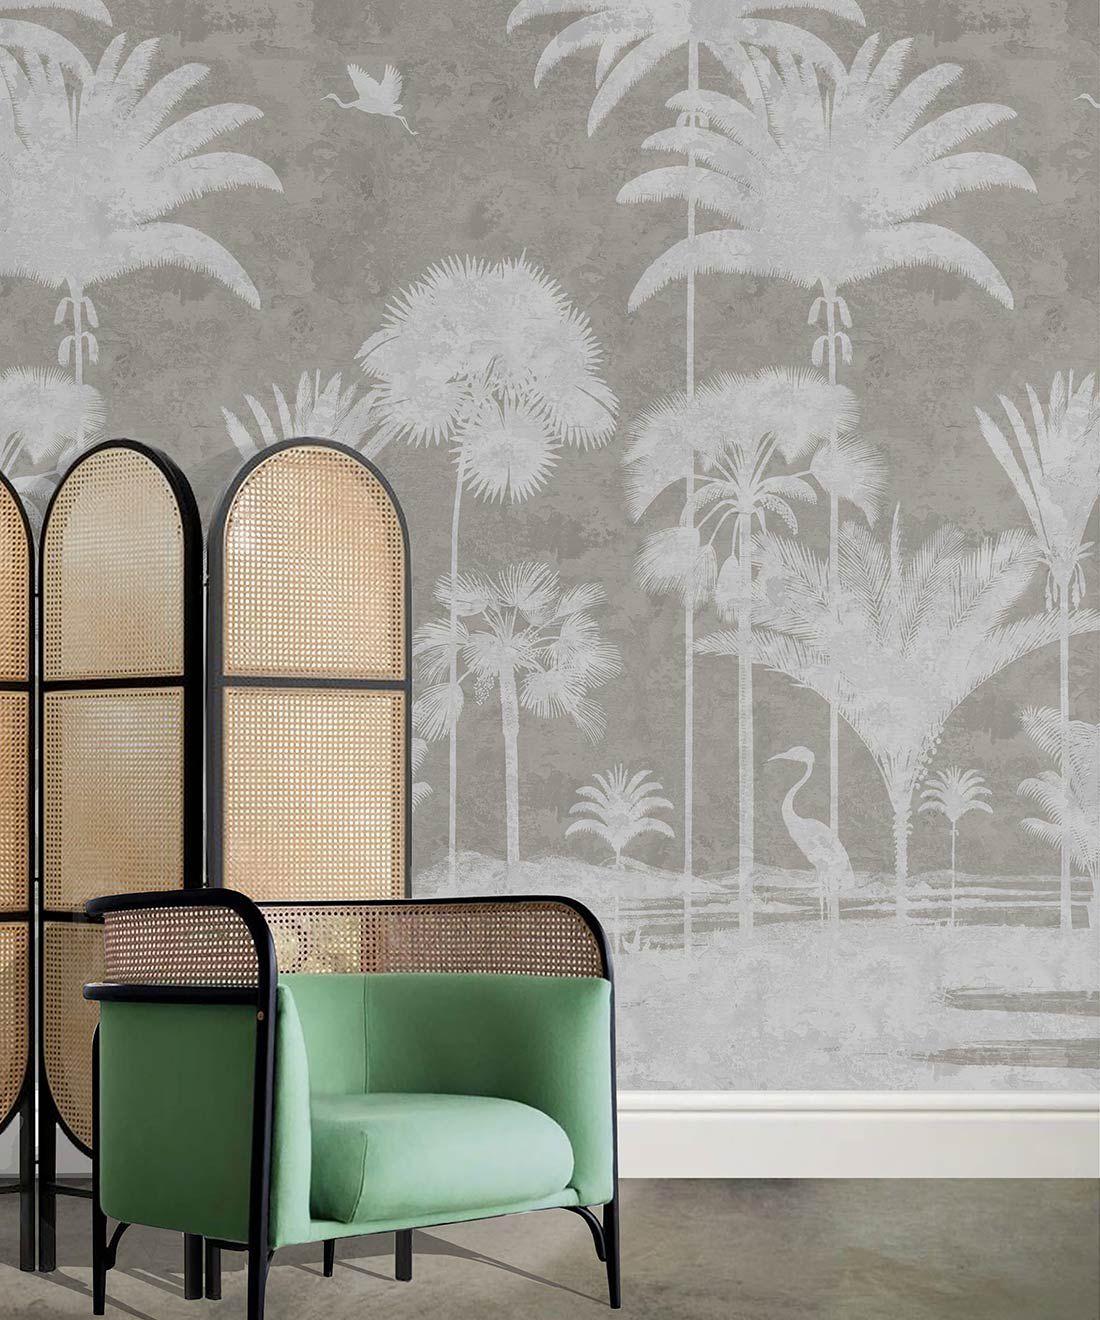 Shadow Palms Wallpaper Mural •Bethany Linz • Palm Tree Mural • Beige • Insitu